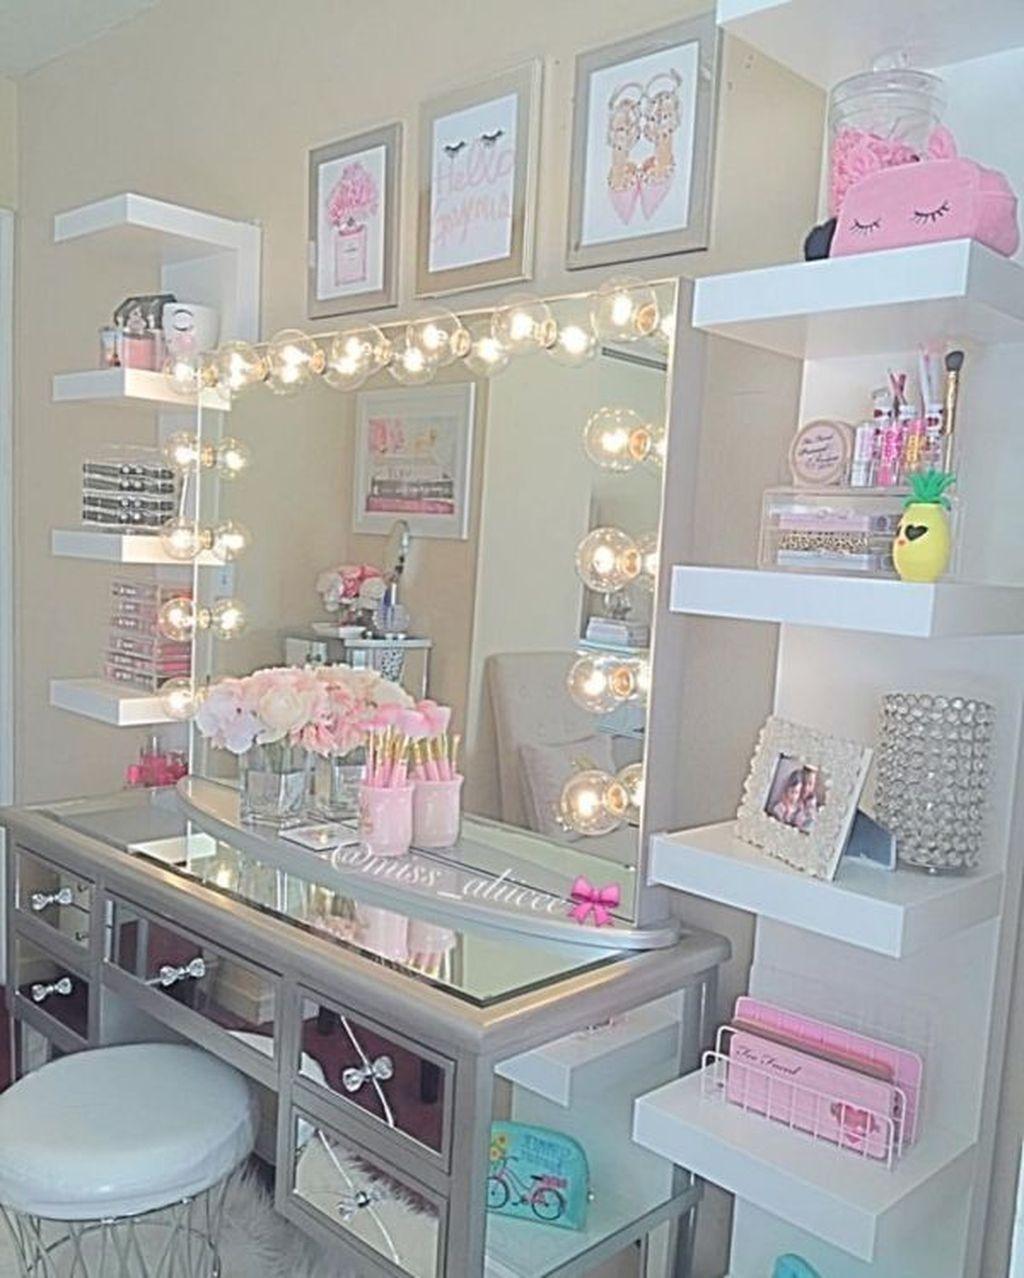 30+ Popular Lighting Design Ideas For Bedroom Looks Beautiful images